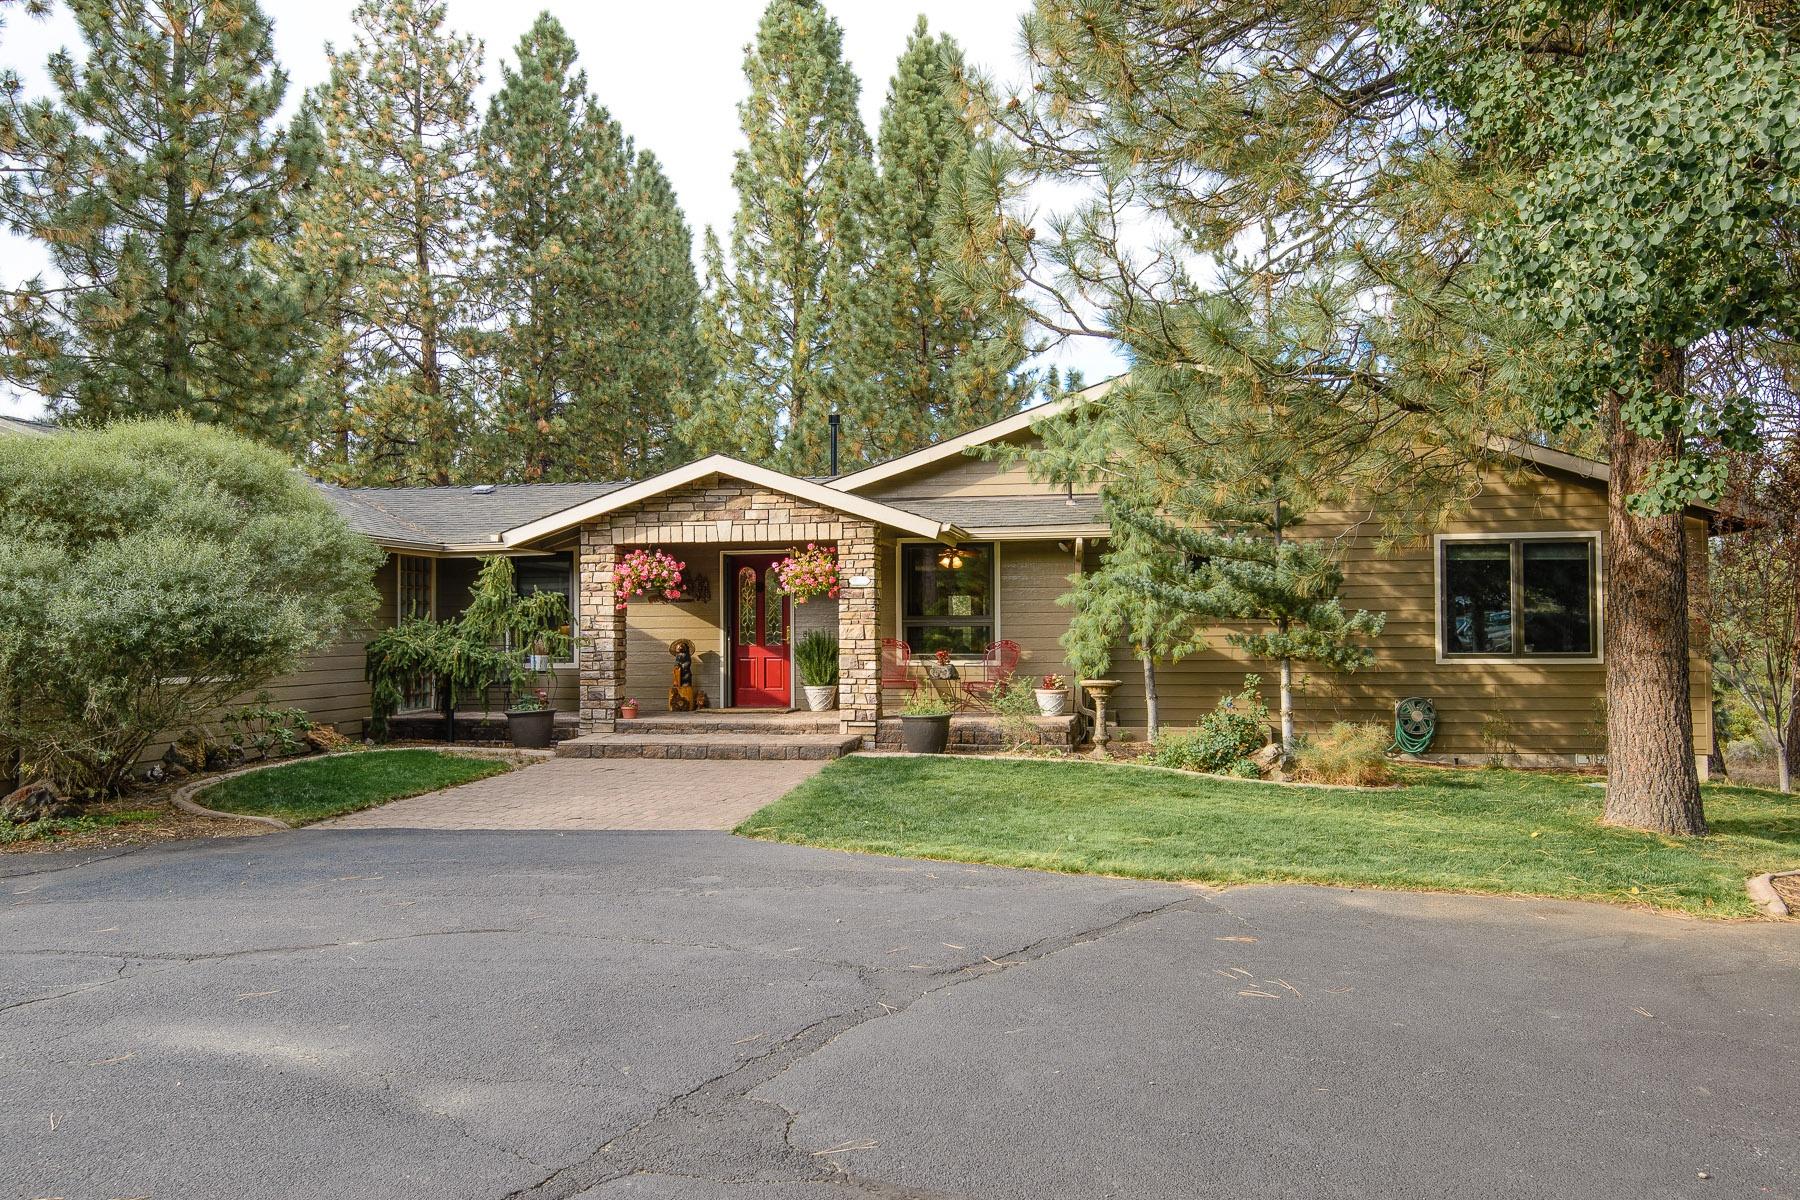 Moradia para Venda às Woodside Ranch 20630 Coventry Cir Bend, Oregon 97702 Estados Unidos